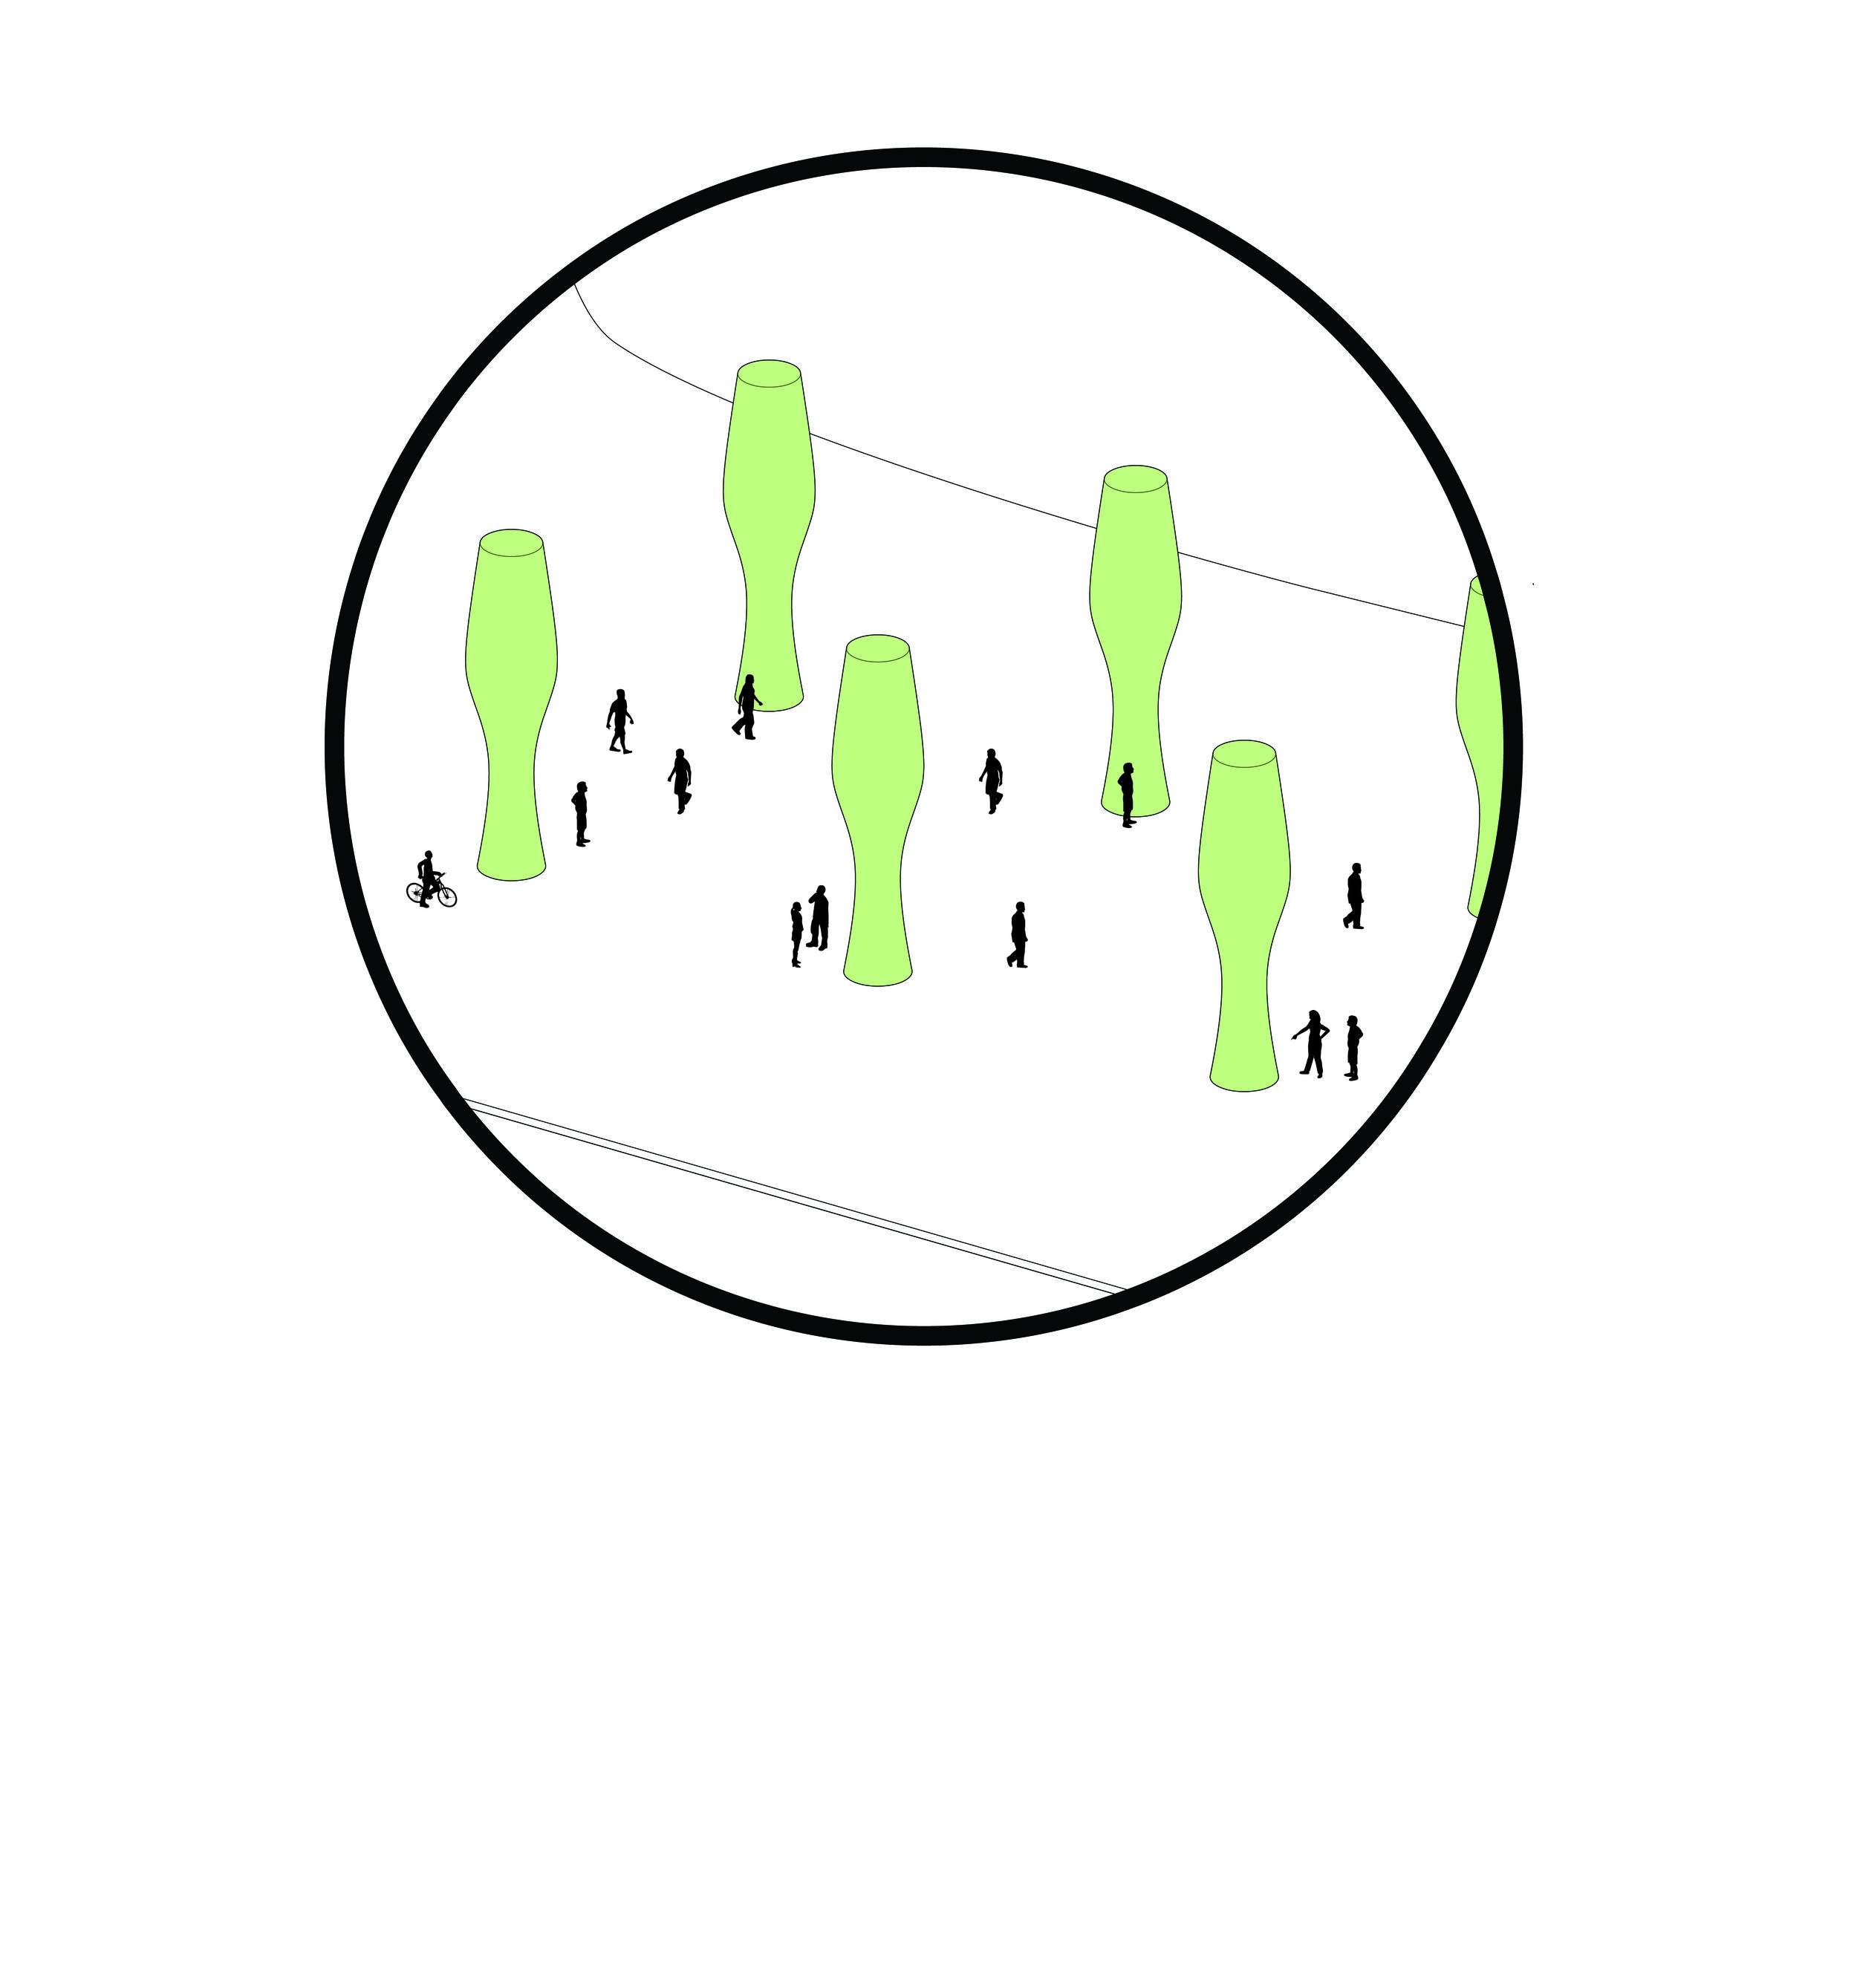 Diagrams-01-03-04.jpg